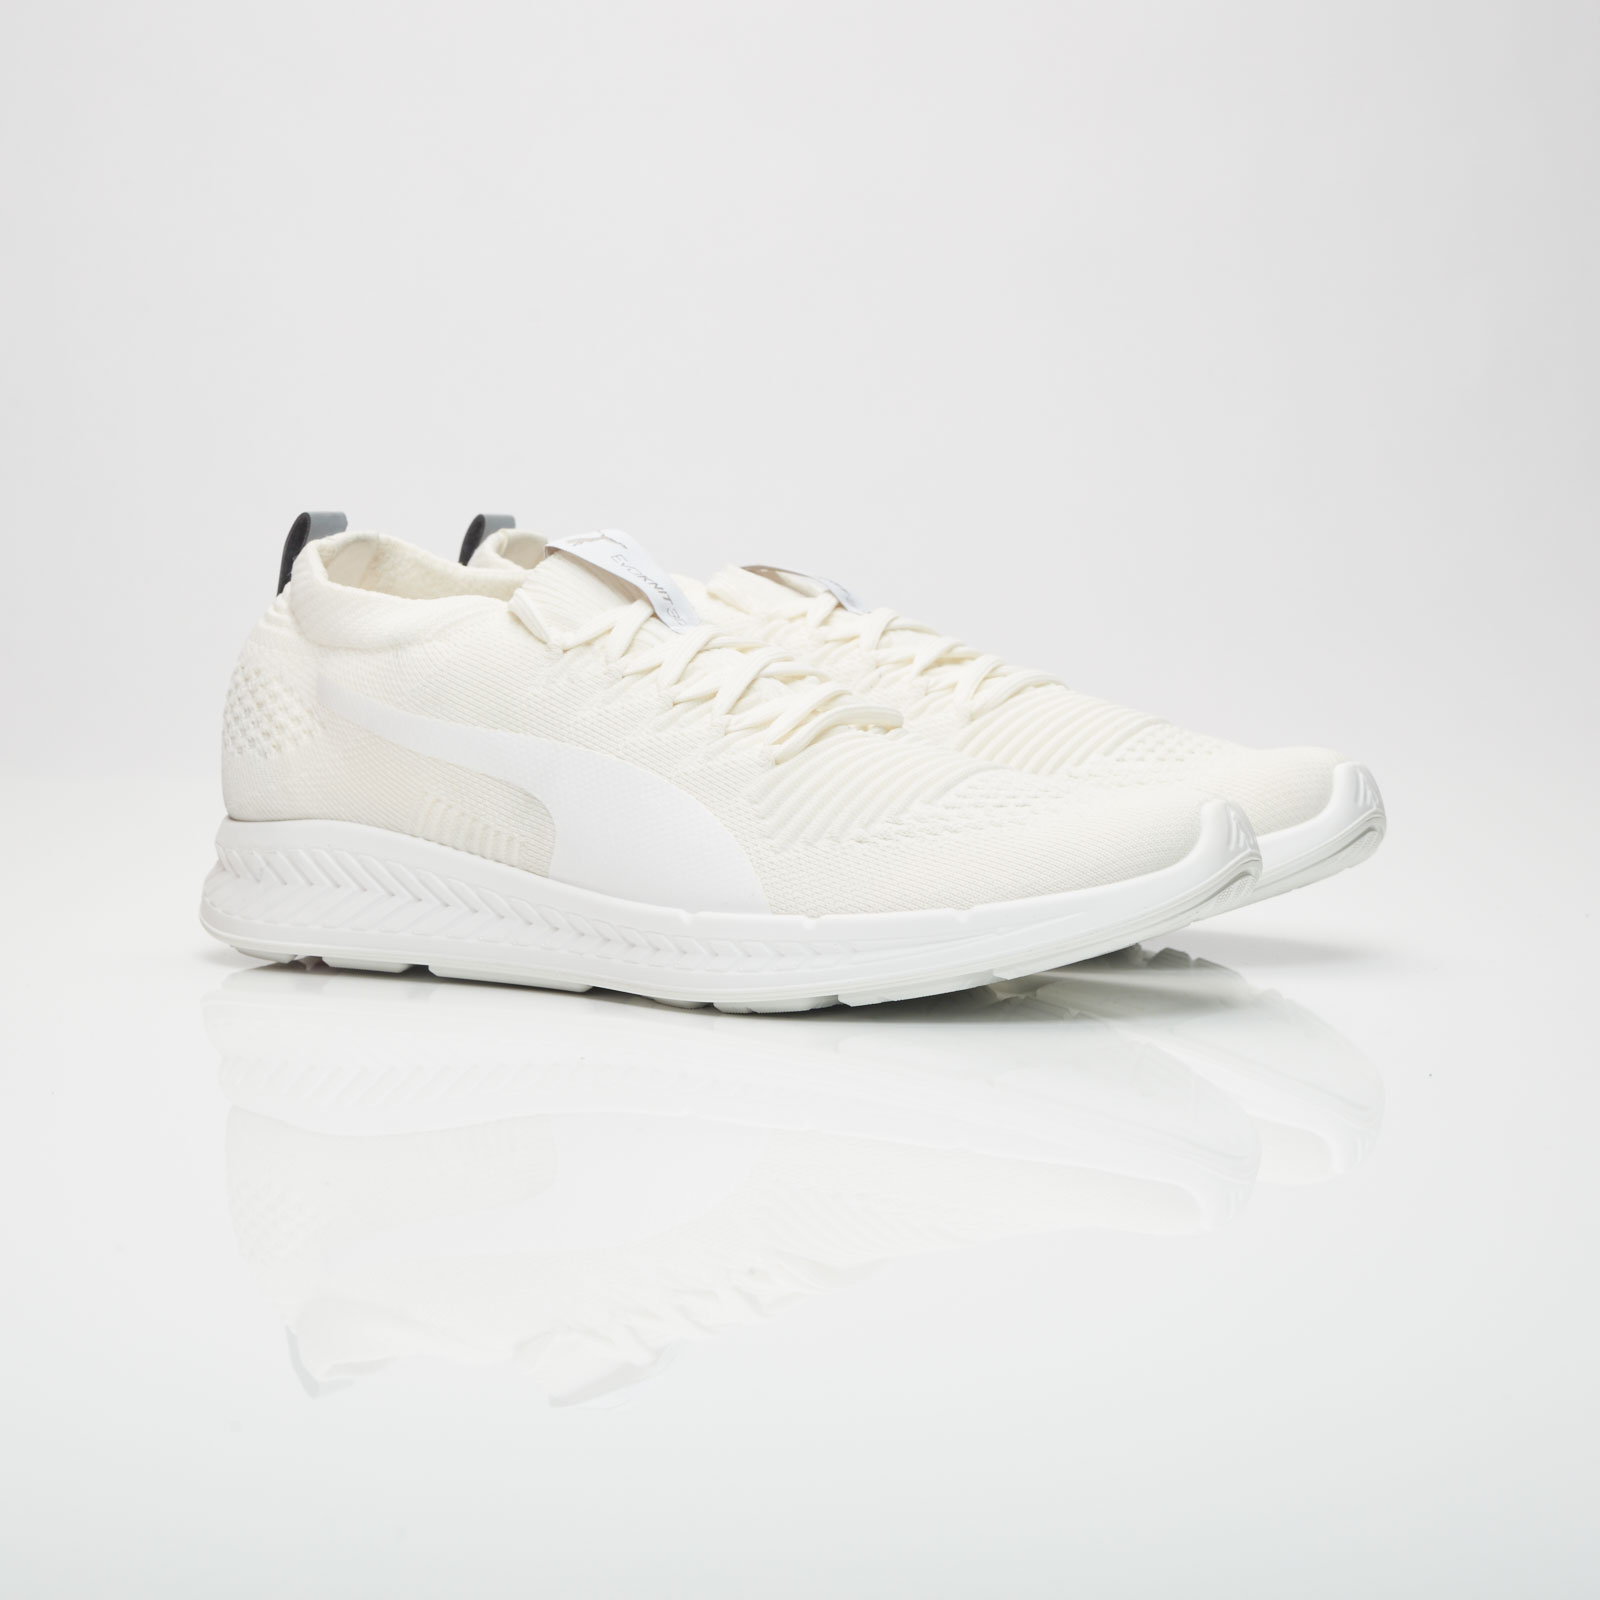 uk availability e6884 6b95c Puma Ignite Evoknit 3D - 189909-09 - Sneakersnstuff ...